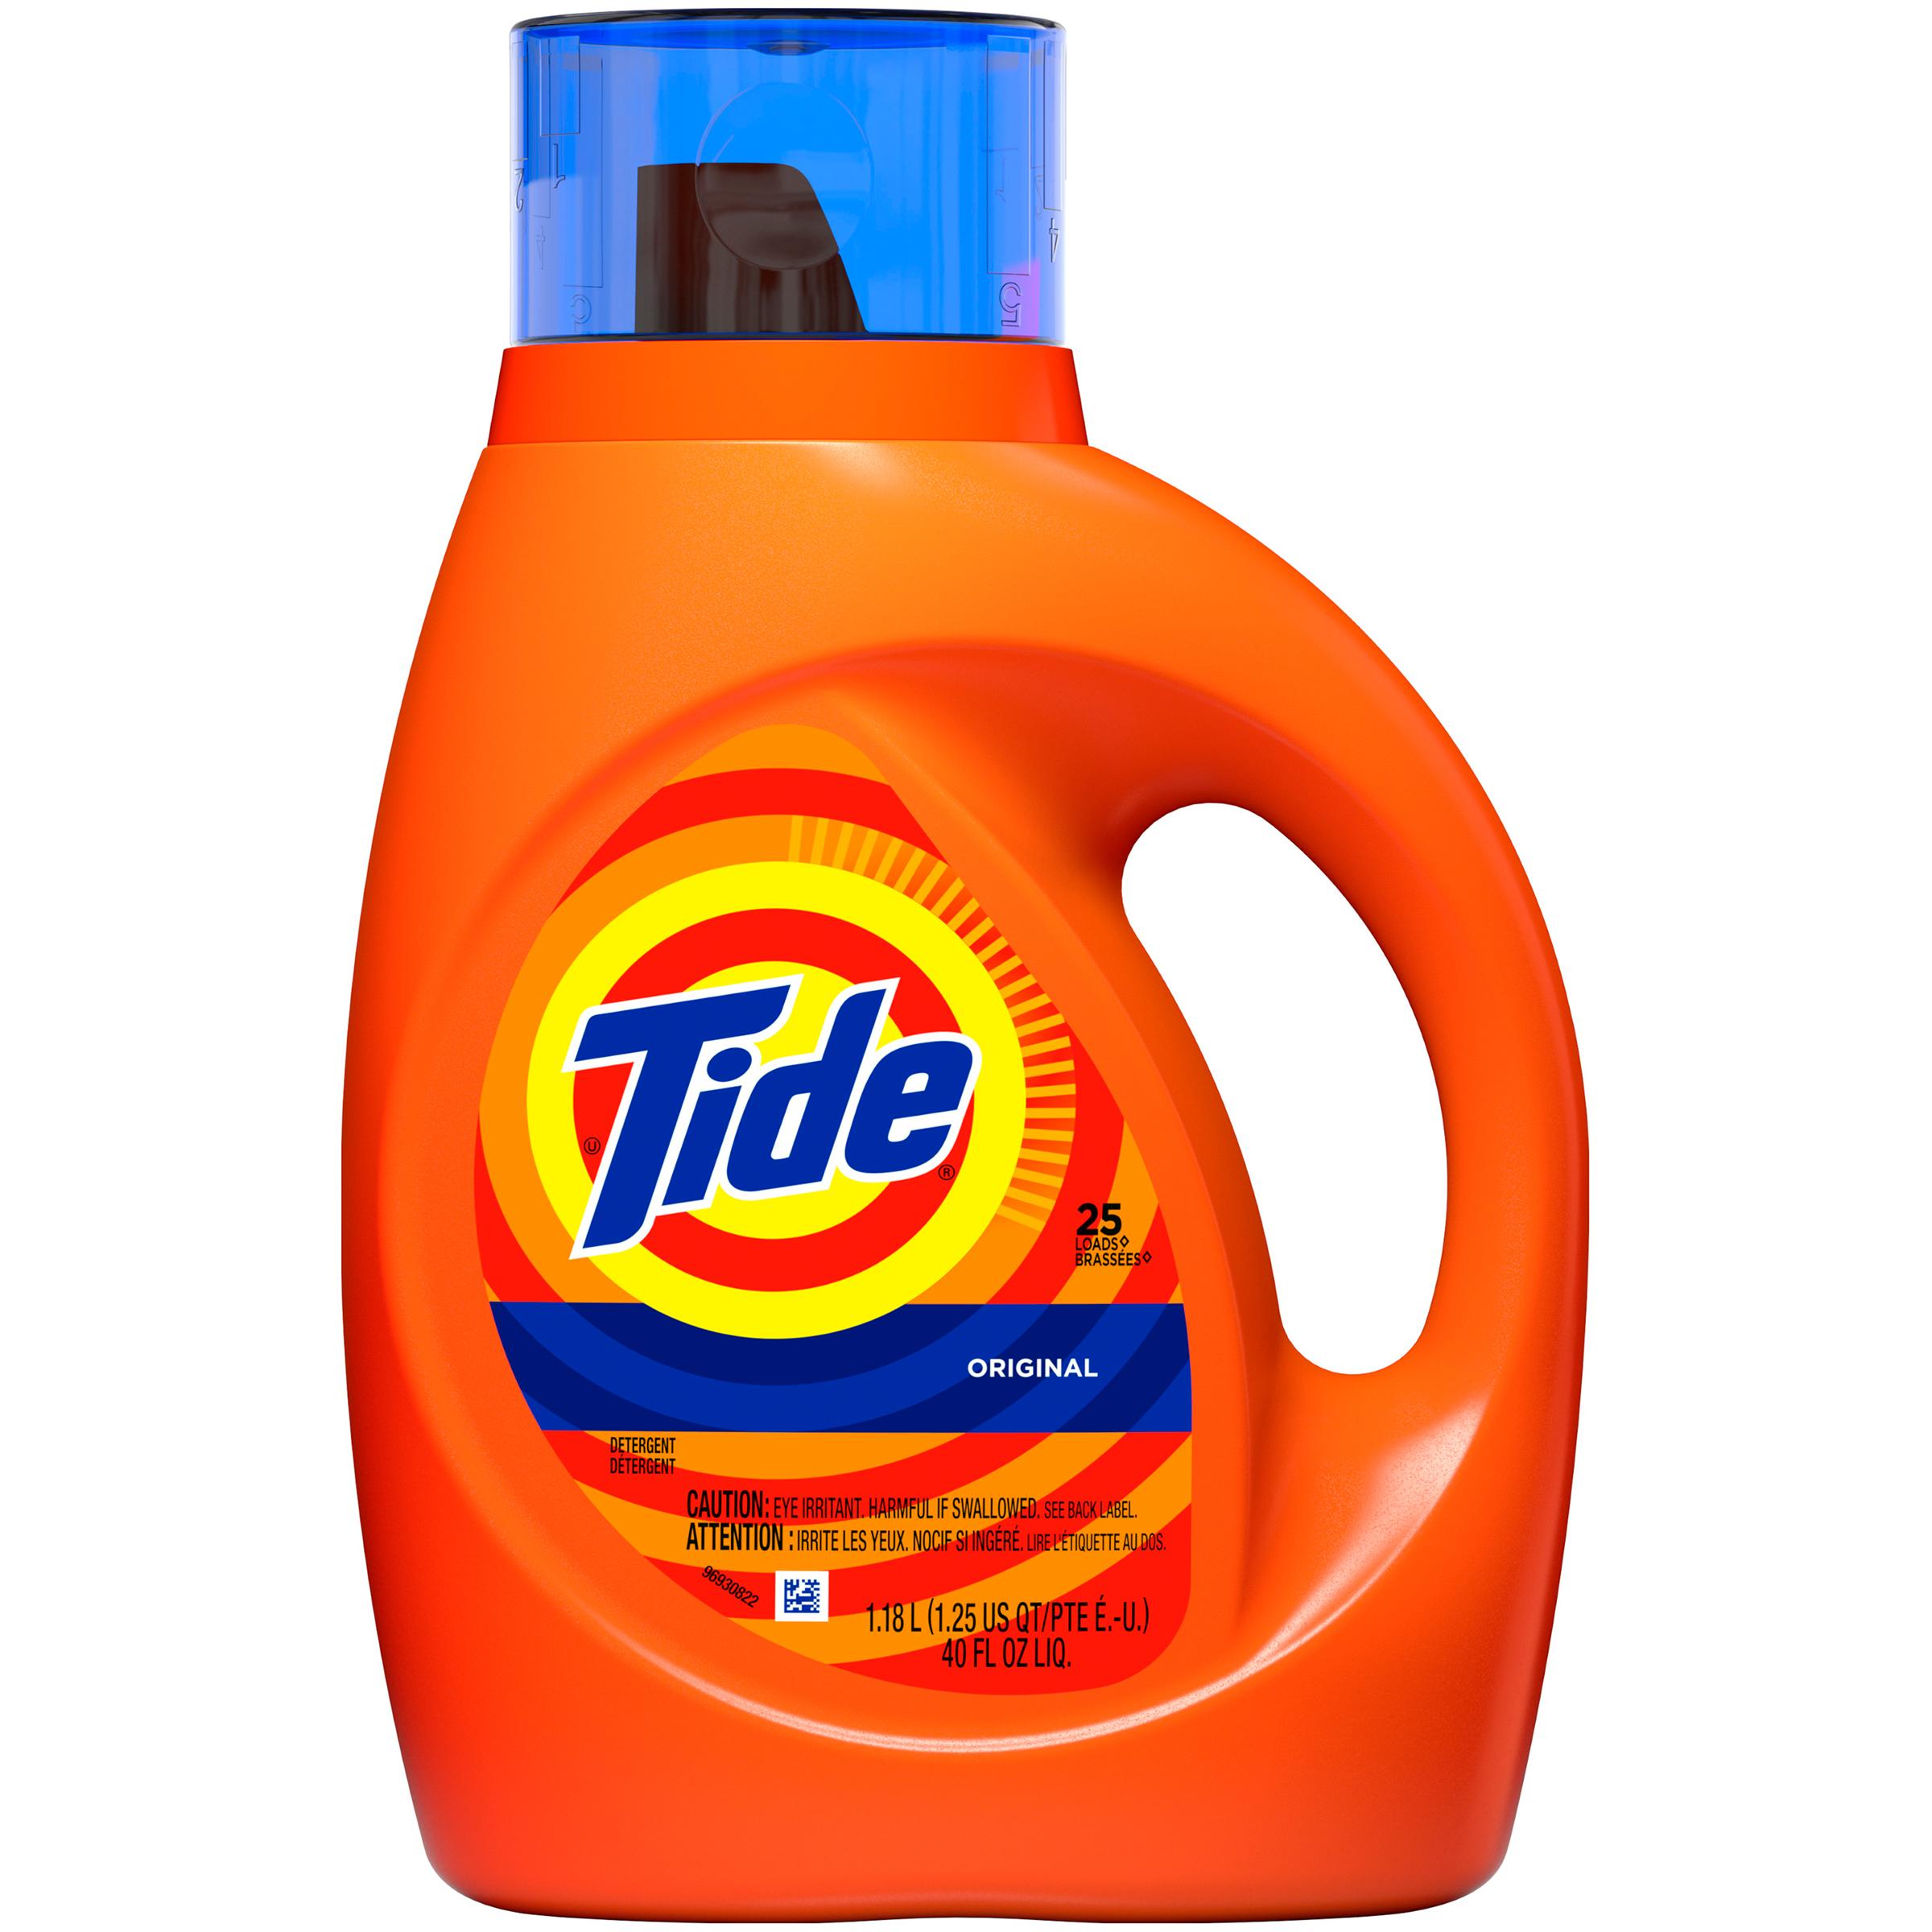 Tide Liquid Laundry Detergent, 40 Fl Oz (118 L